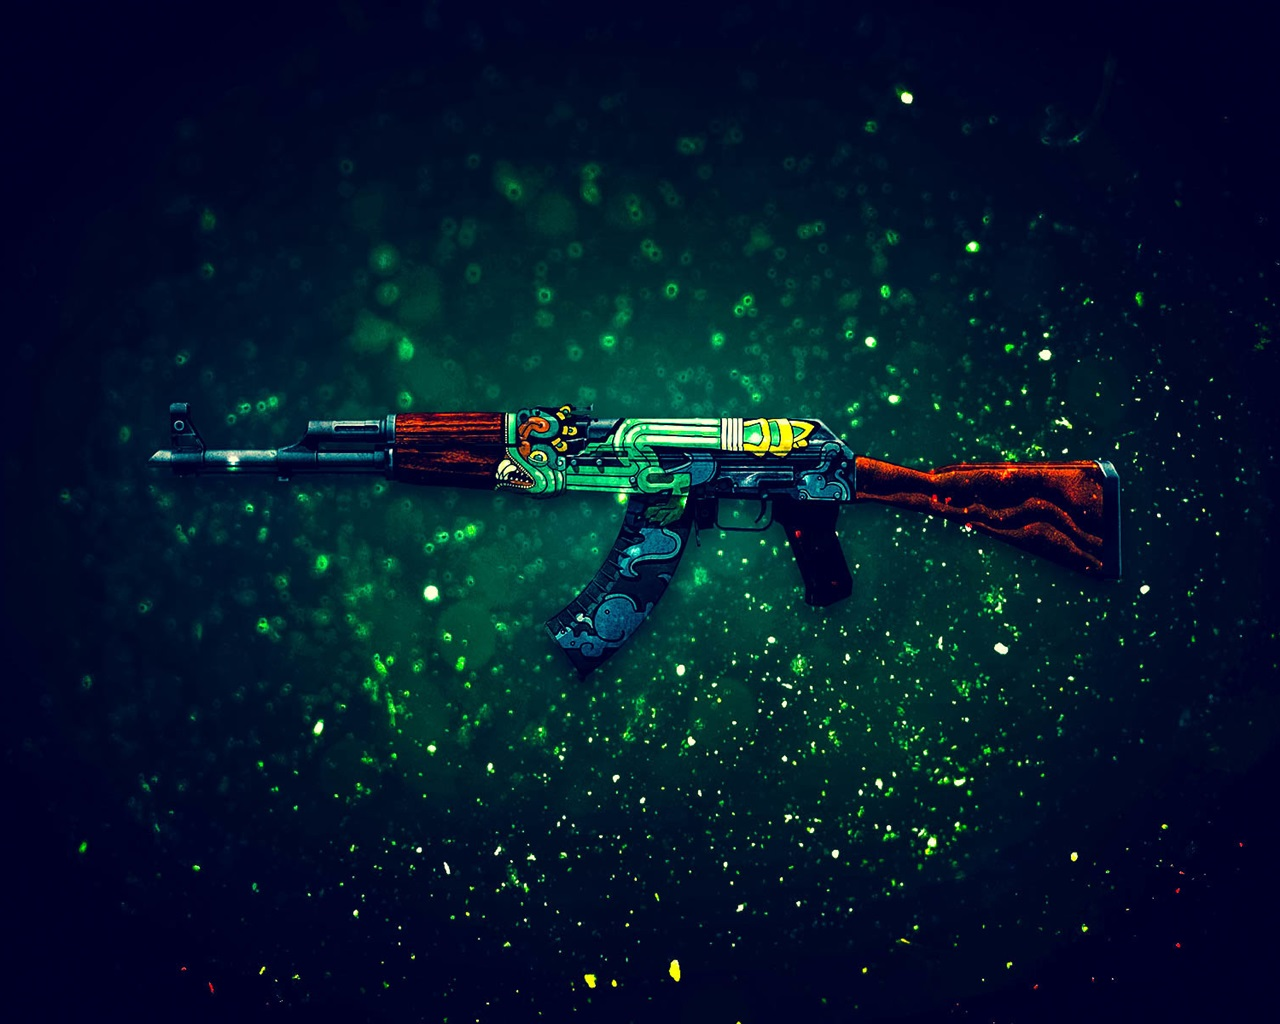 Papéis De Parede CS GO Jogo, Rifle De Assalto AK-47